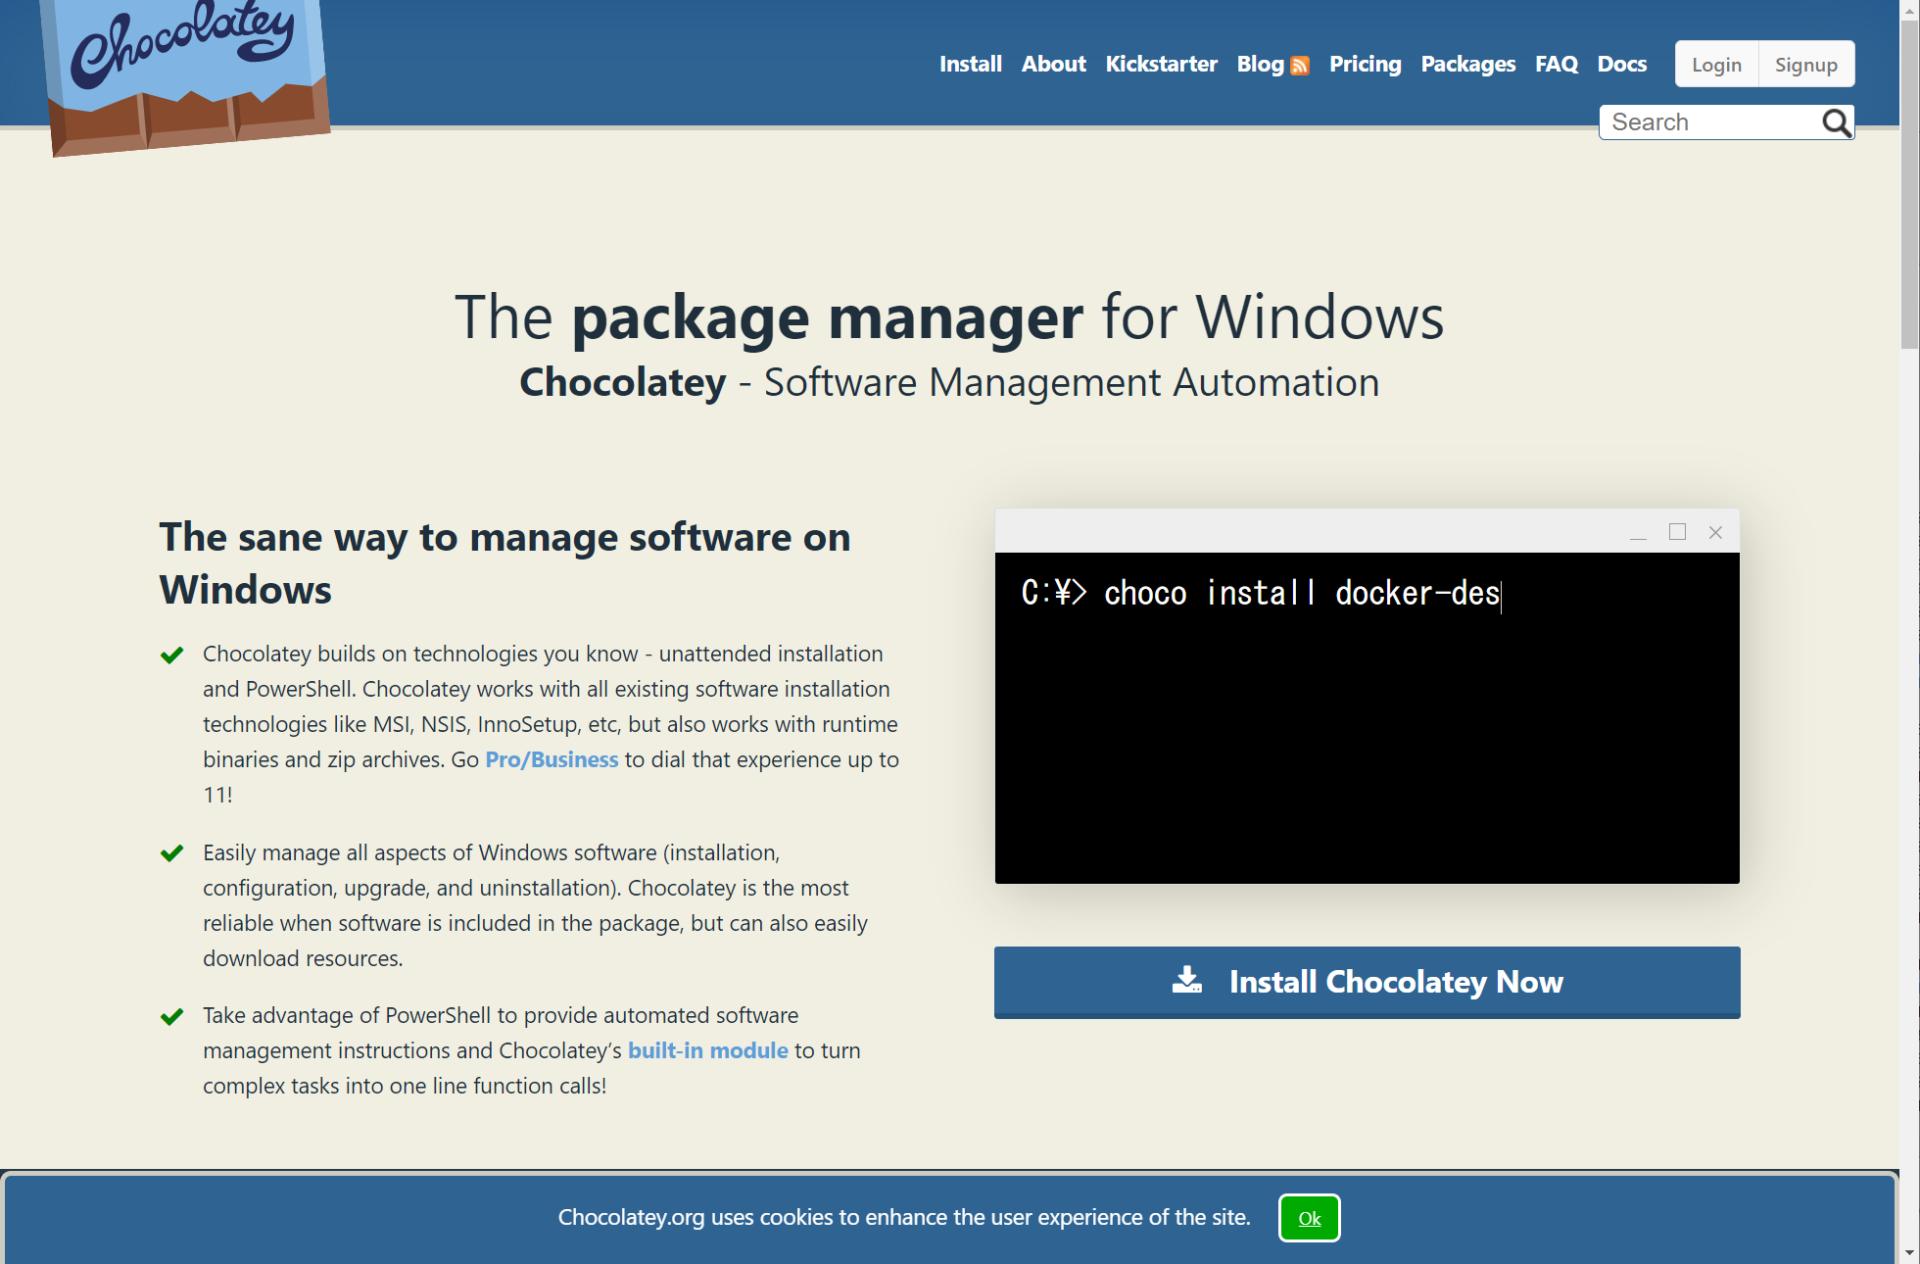 Windowsをクリーンインストール状態から、一気に必要なソフトを揃えられるコマンドラインソフト